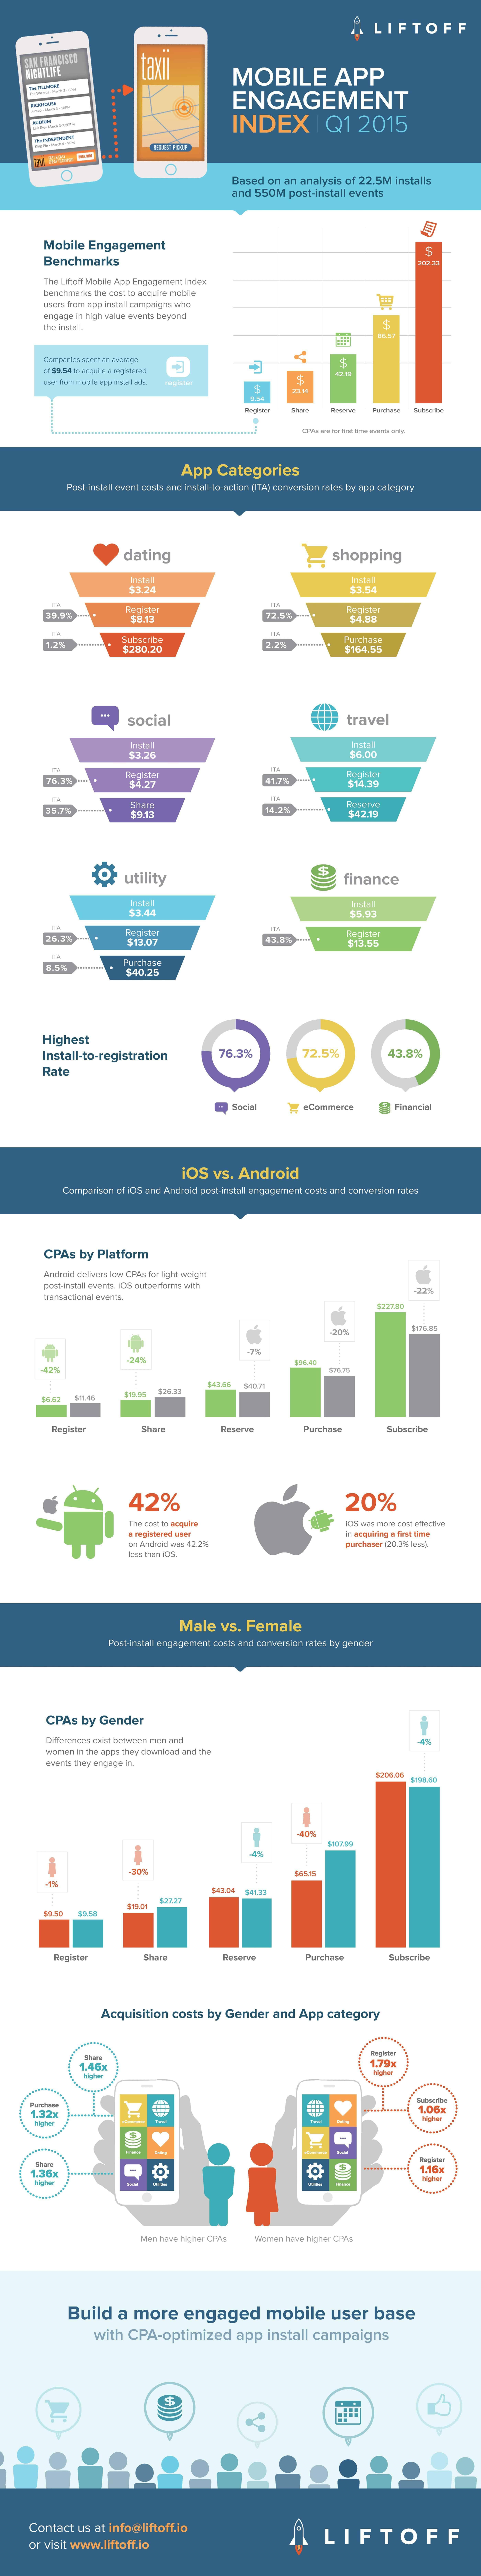 App Engagement Infographic[1]